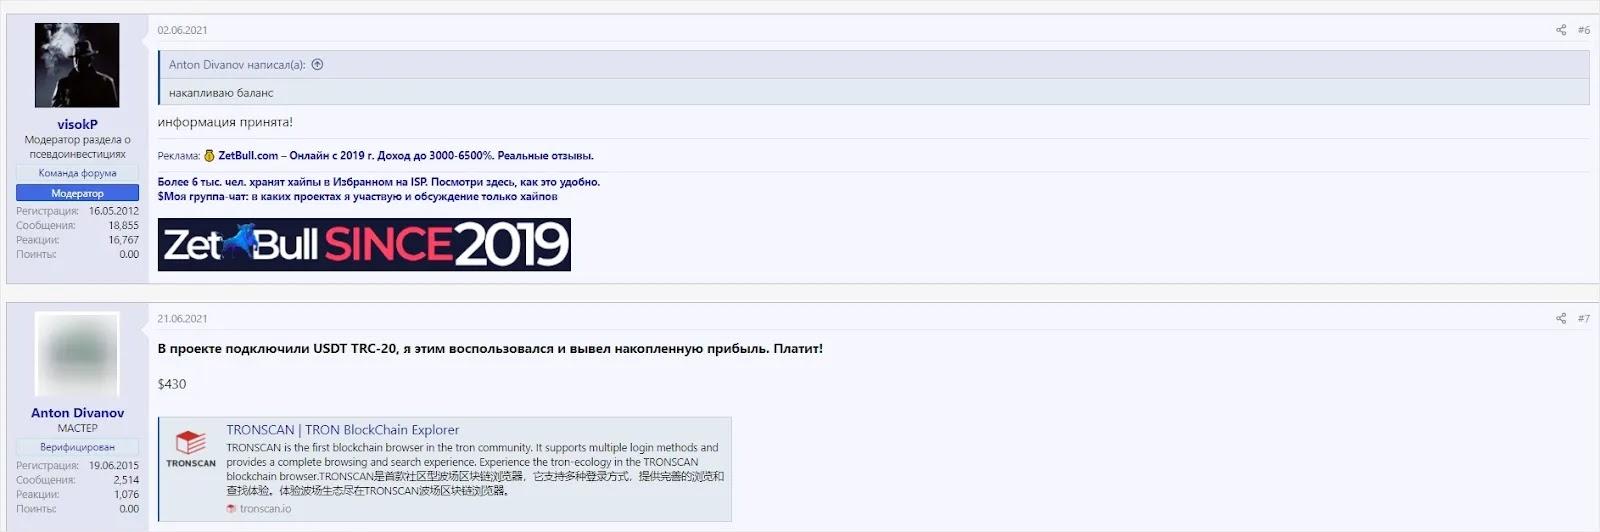 Отзывы о Raf Systems 2